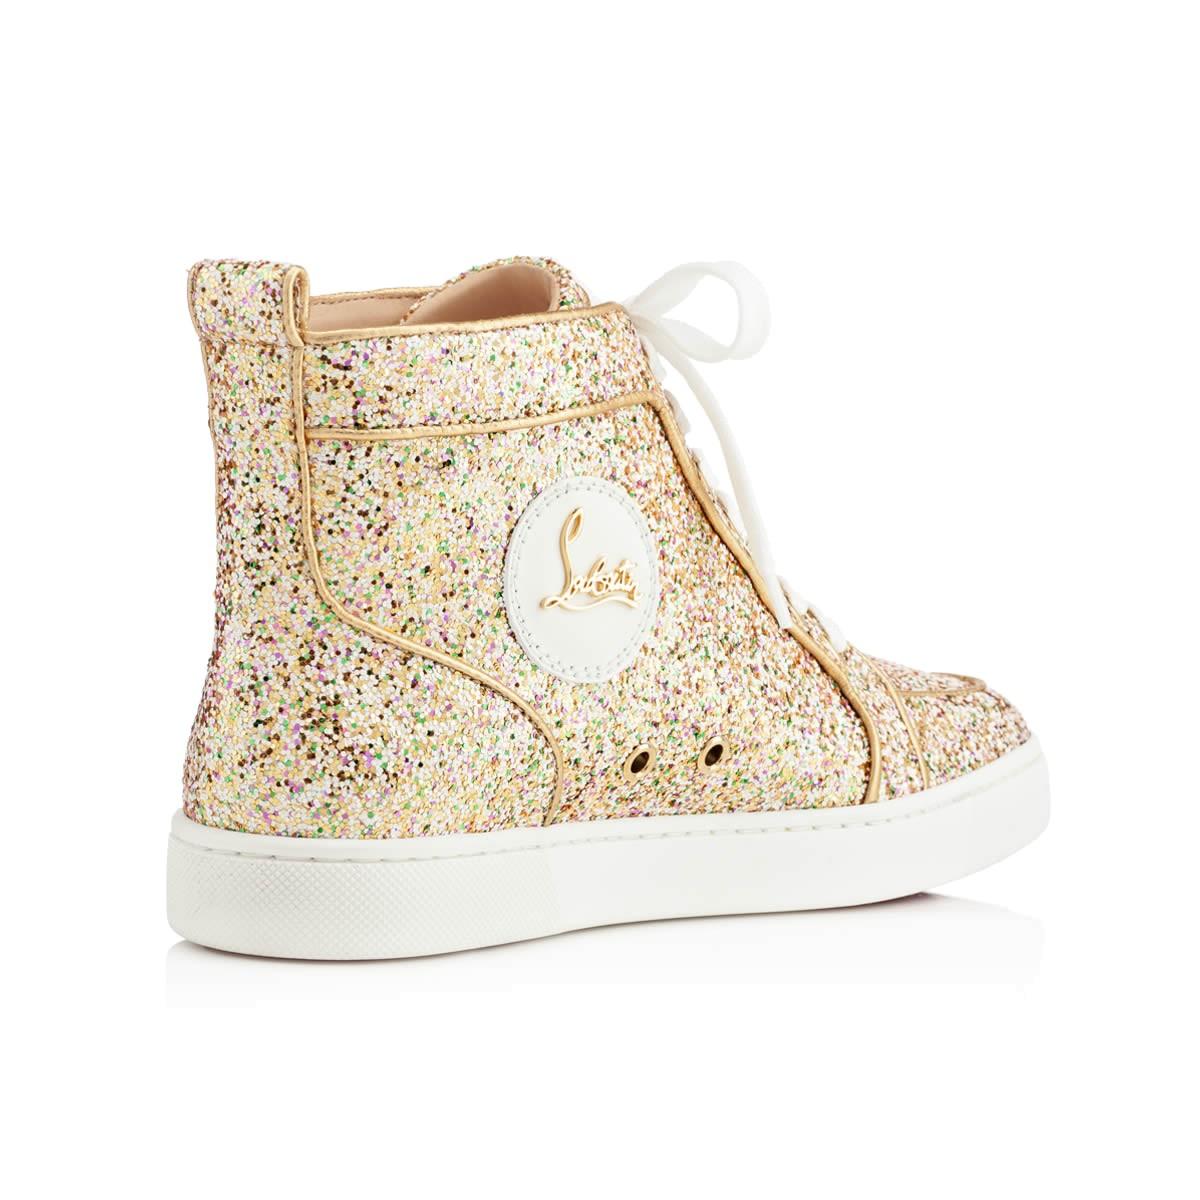 louboutin gold glitter sneakers